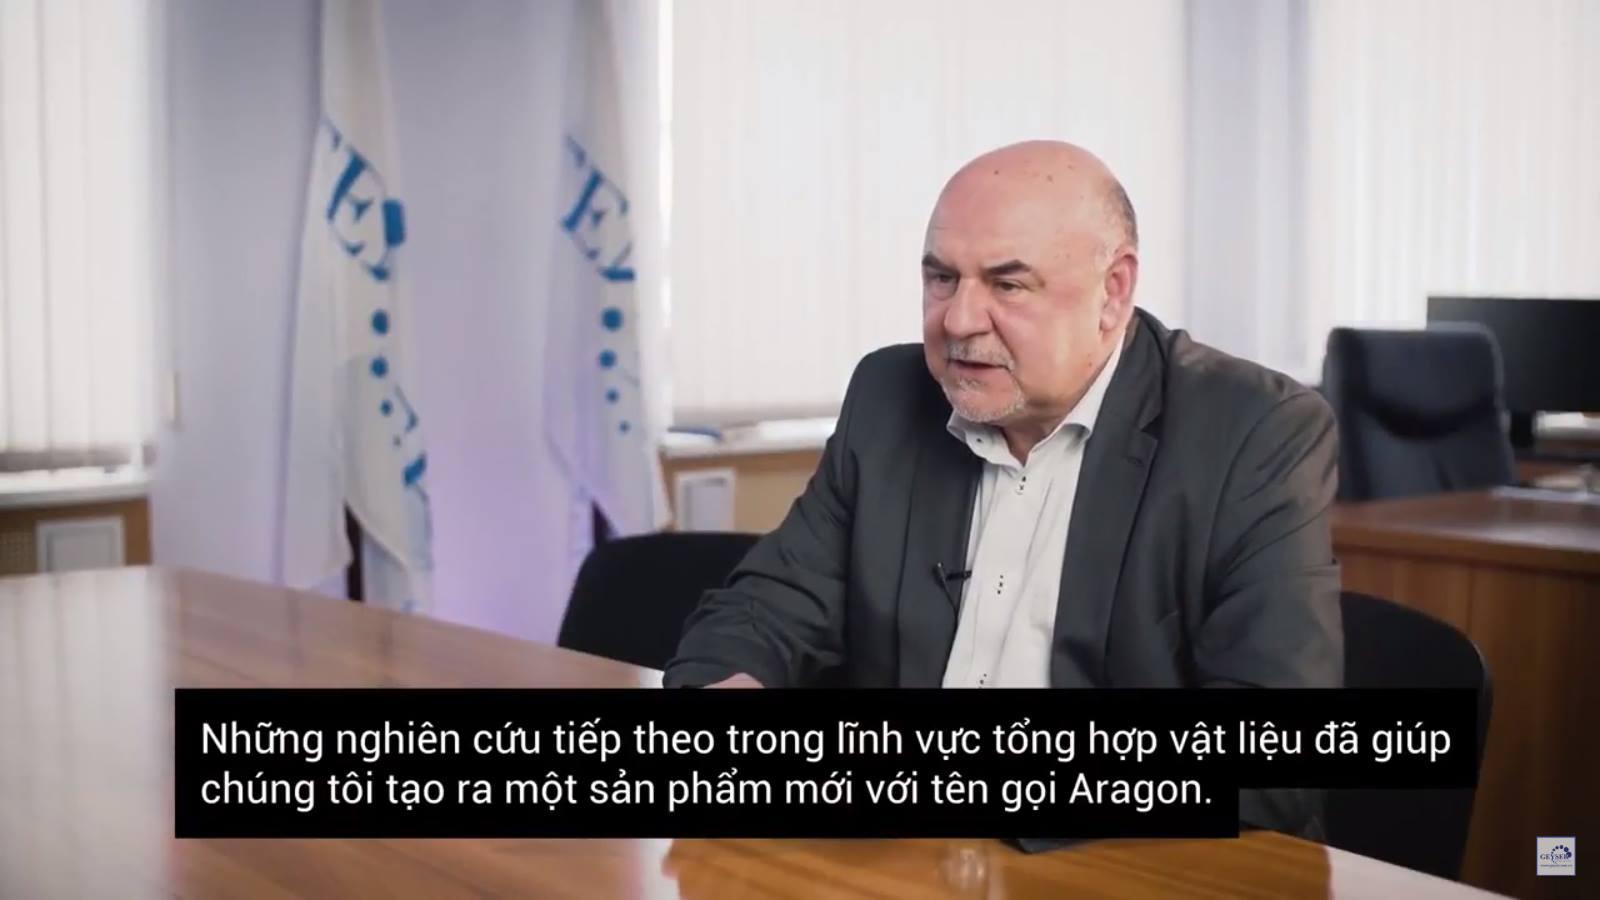 liệu lọc Aragon